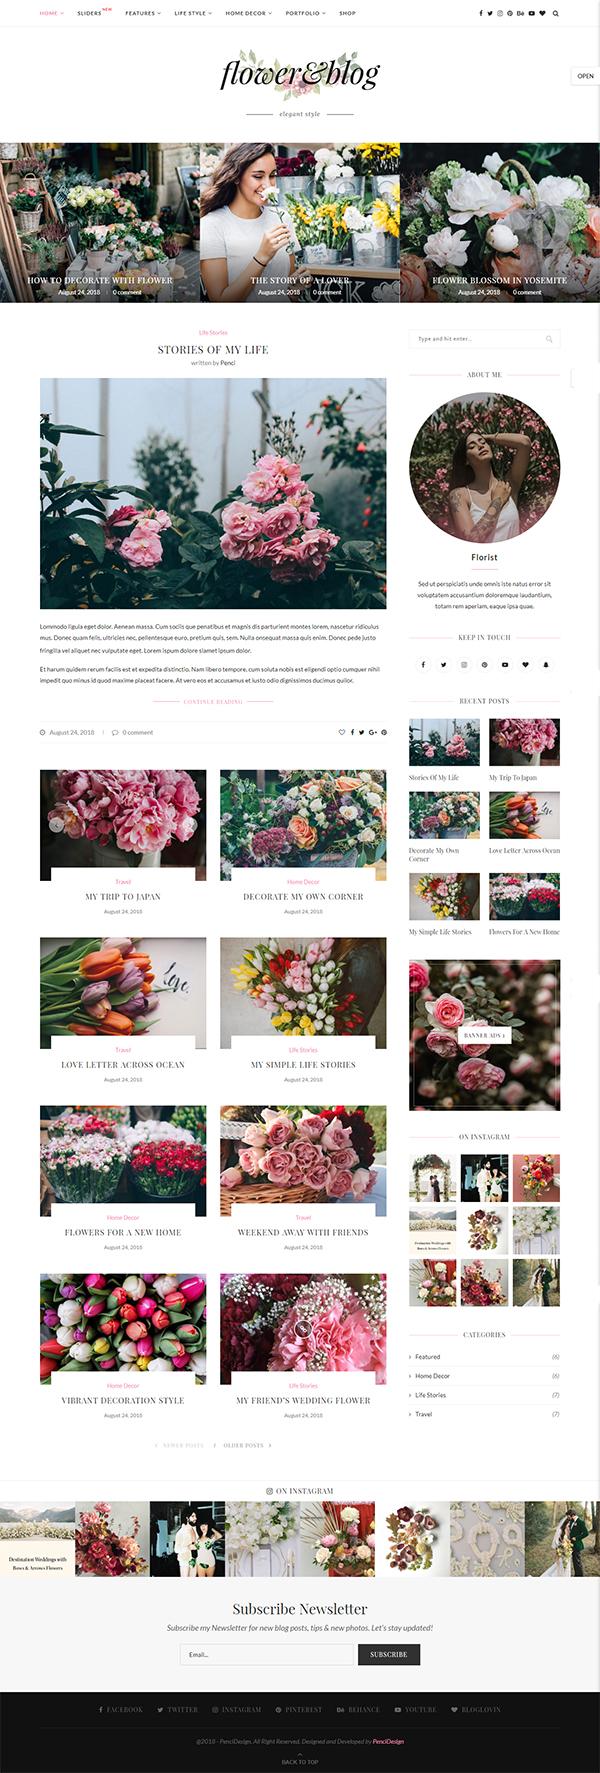 Soledad - Multi-Concept Blog/Magazine/News AMP WordPress Theme